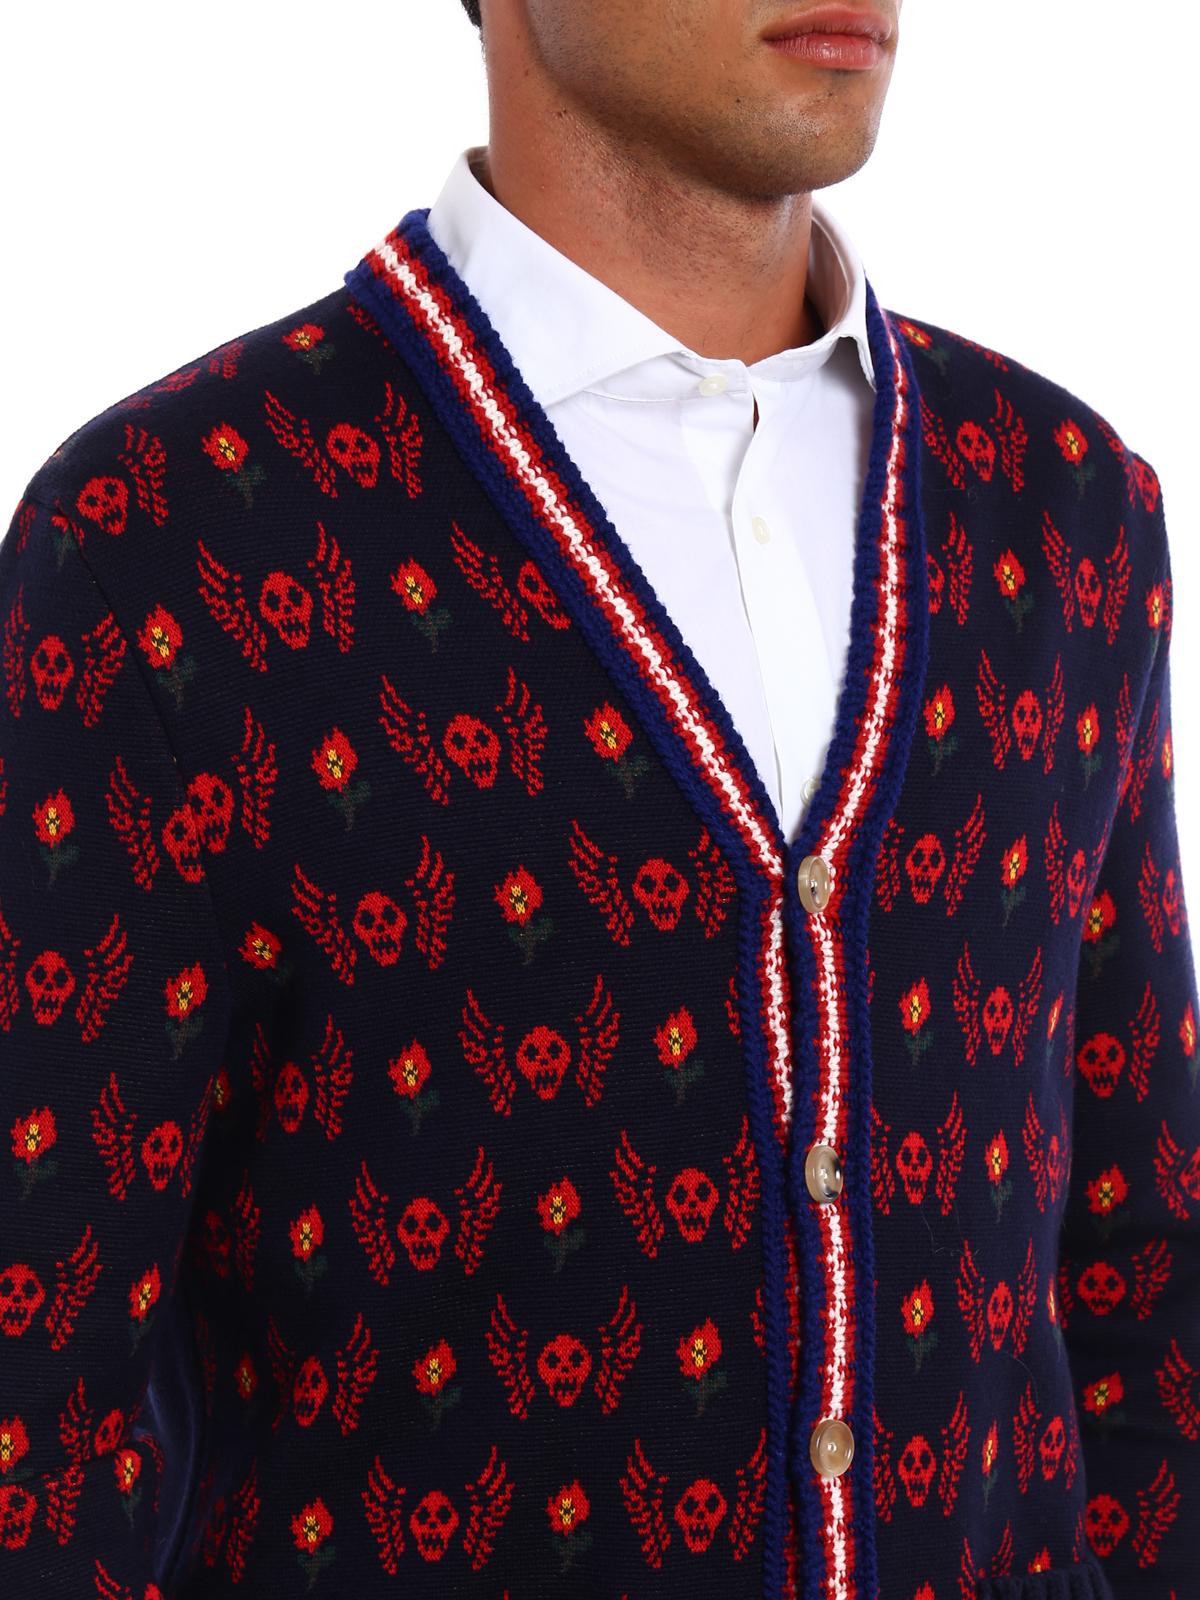 Skull jacquard wool cardigan by Gucci - cardigans   iKRIX